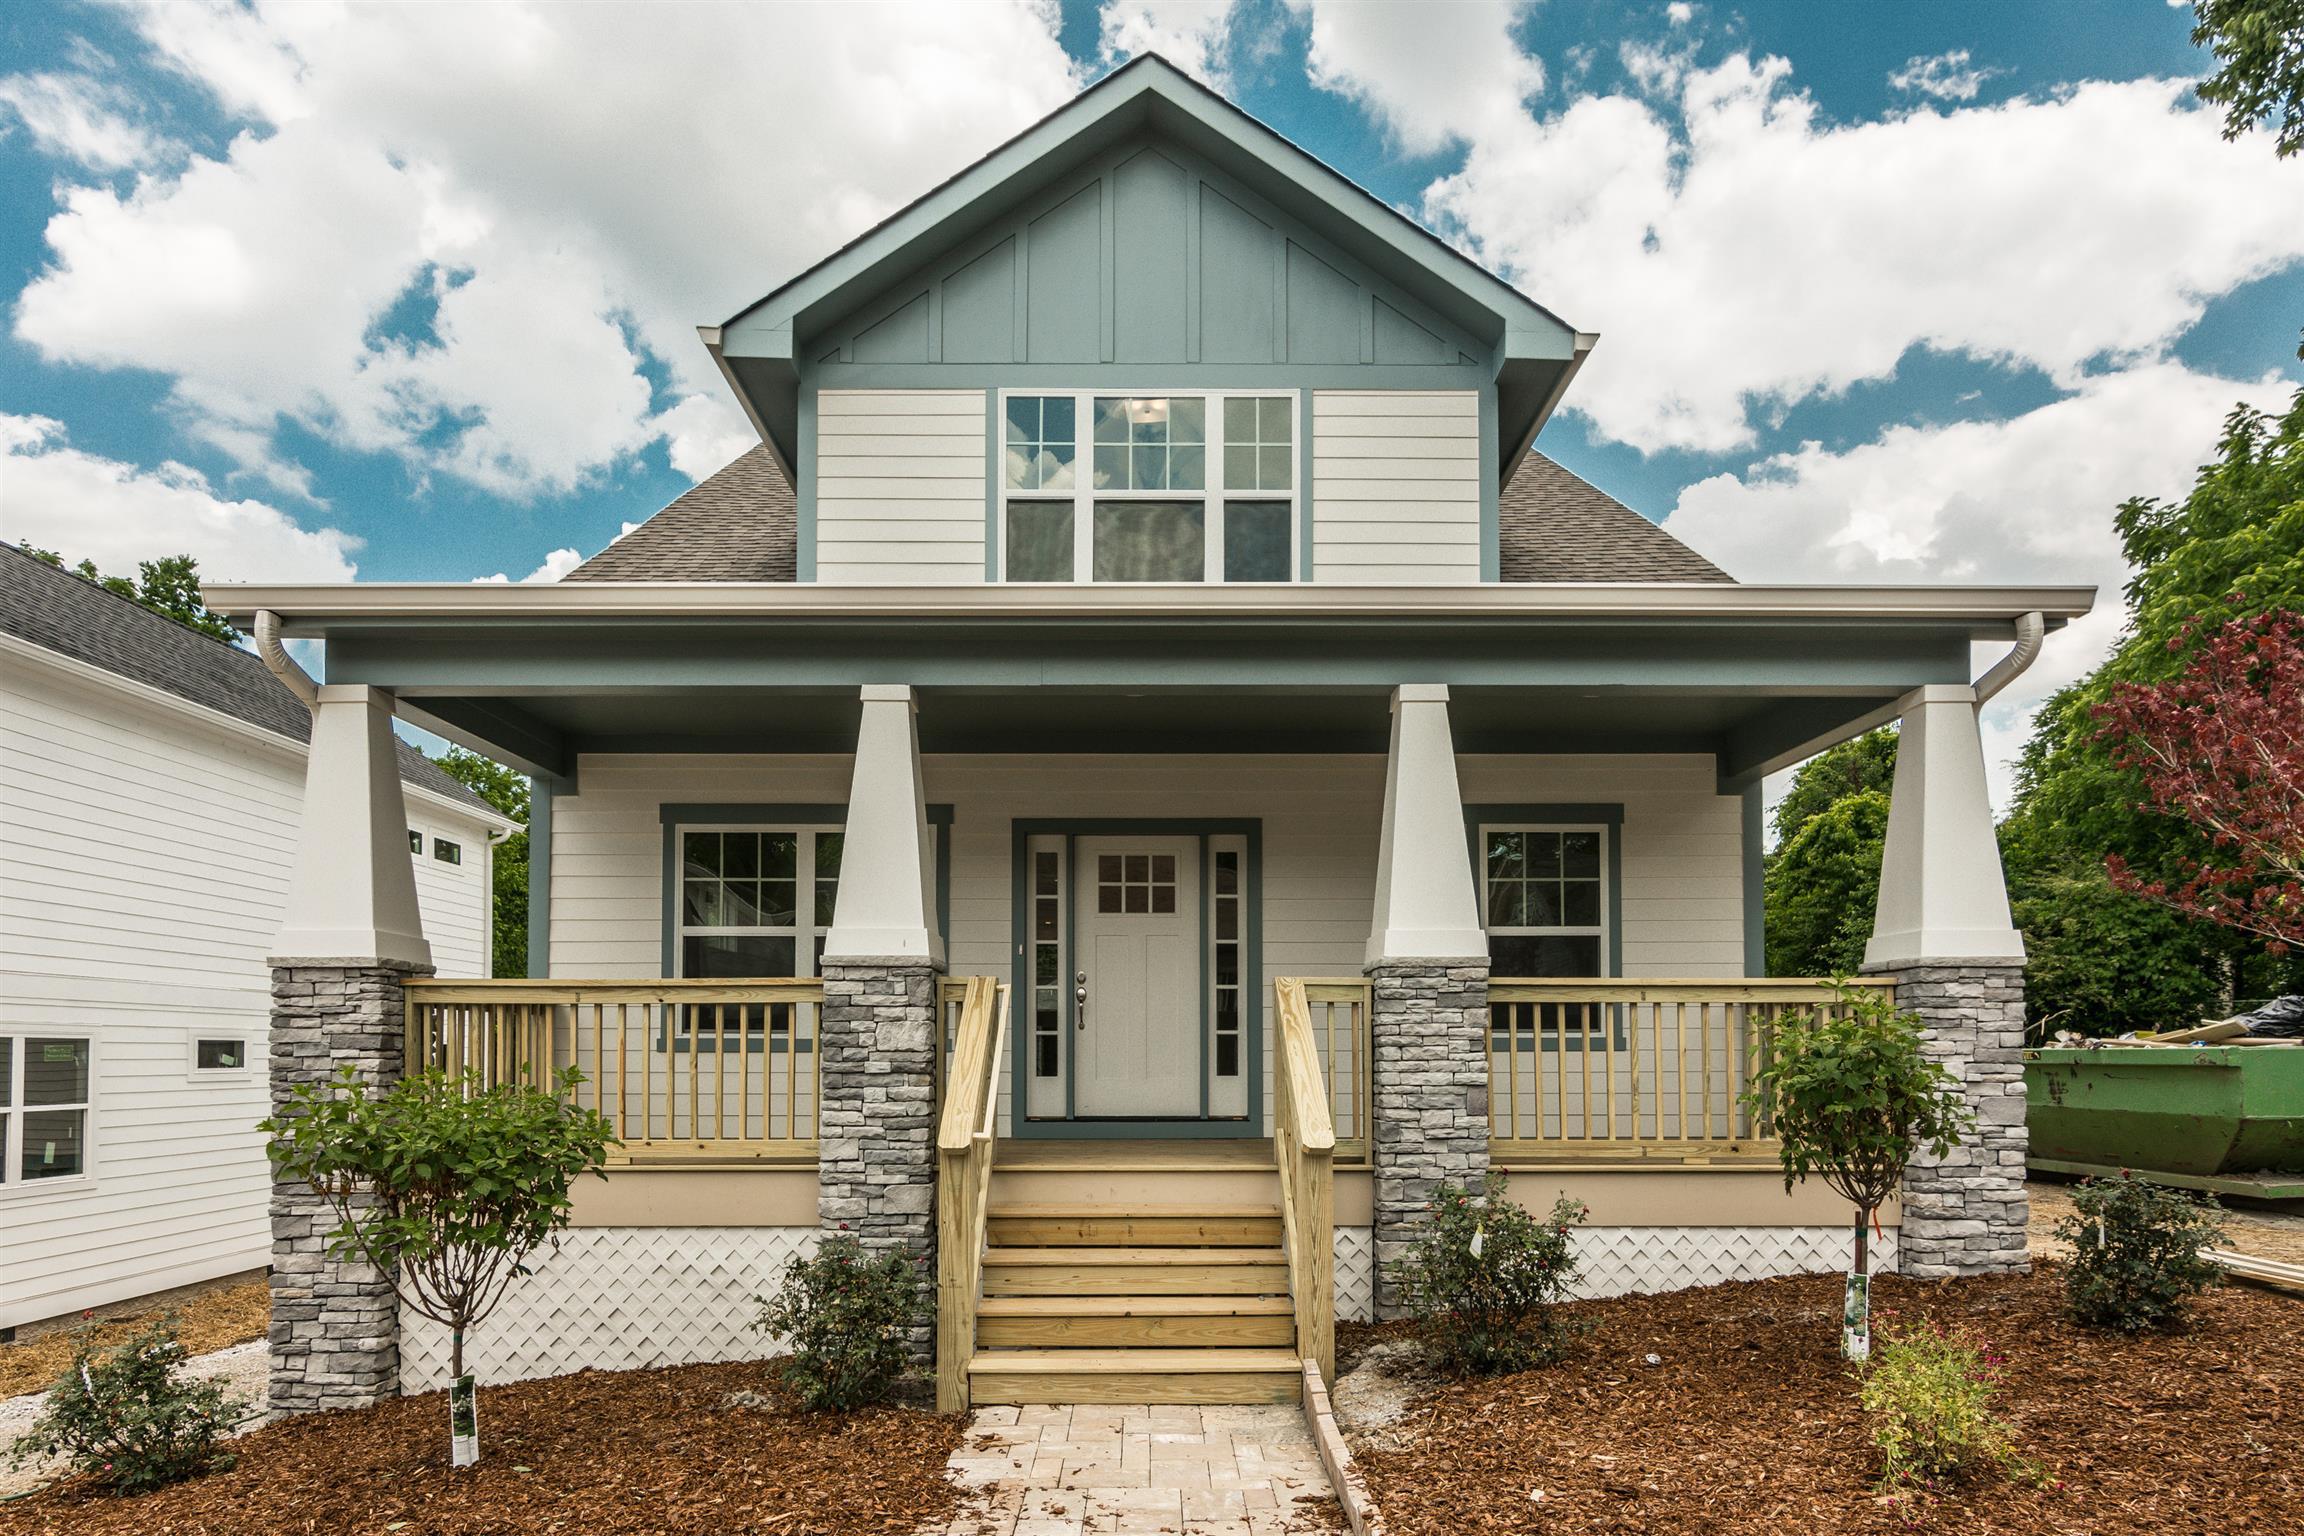 925b Delmas Ave, Nashville, TN 37216 - Nashville, TN real estate listing